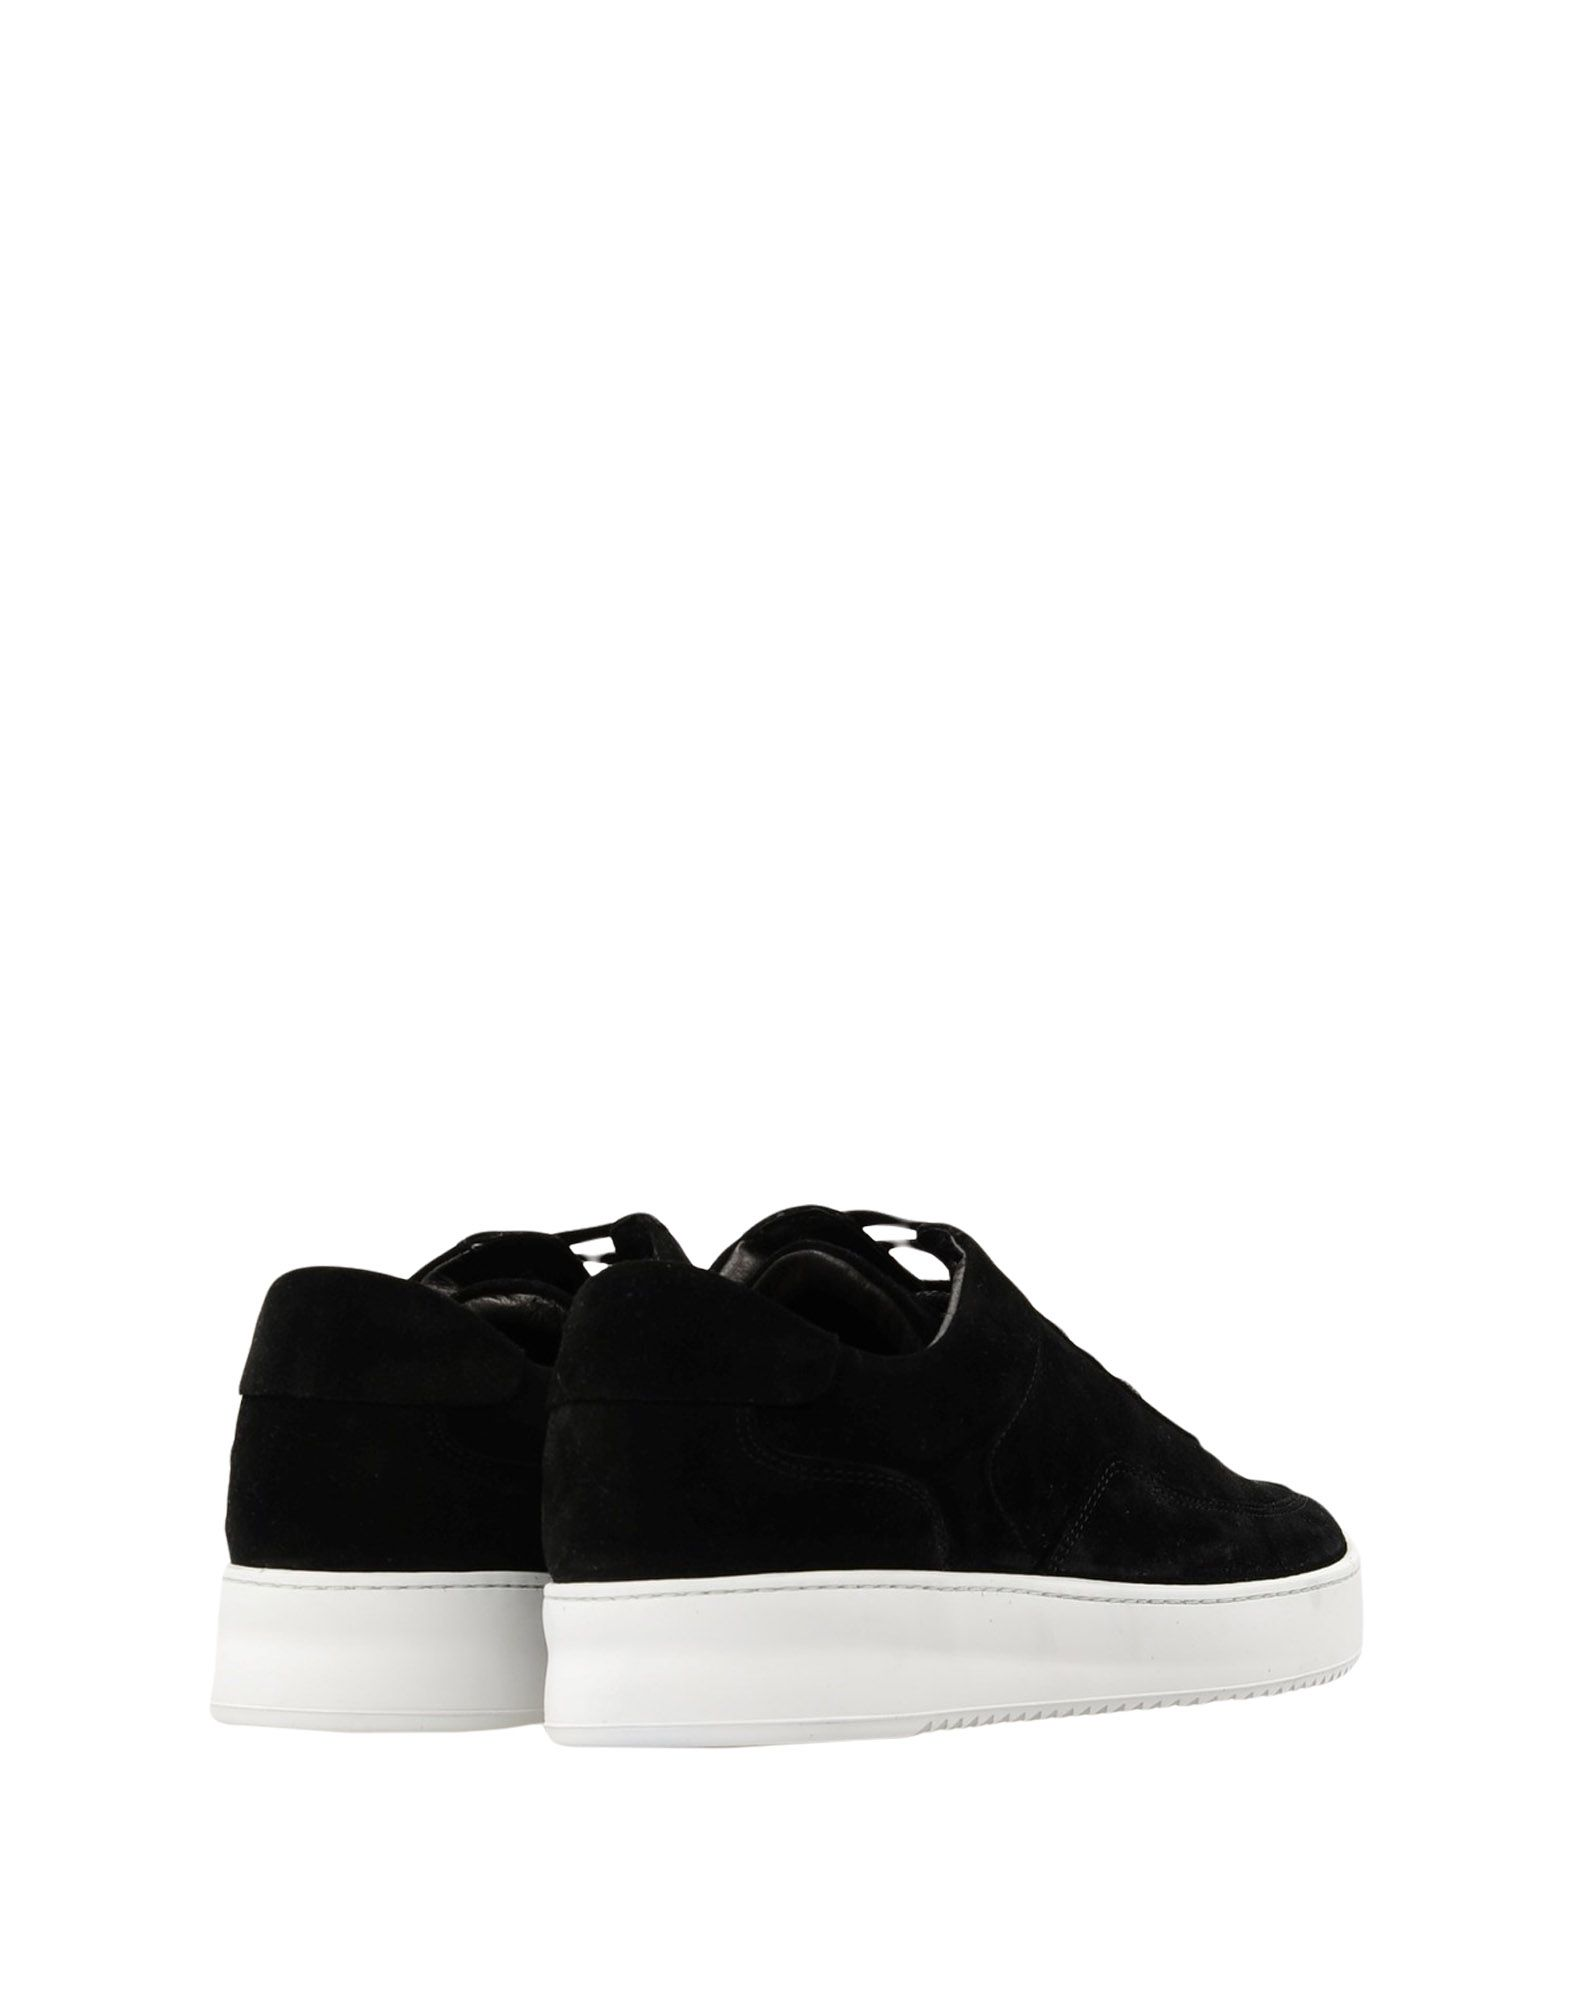 Filling Pieces Low Mondo Ripple Nardo Suede Black    11441814CB Gute Qualität beliebte Schuhe ef4de1